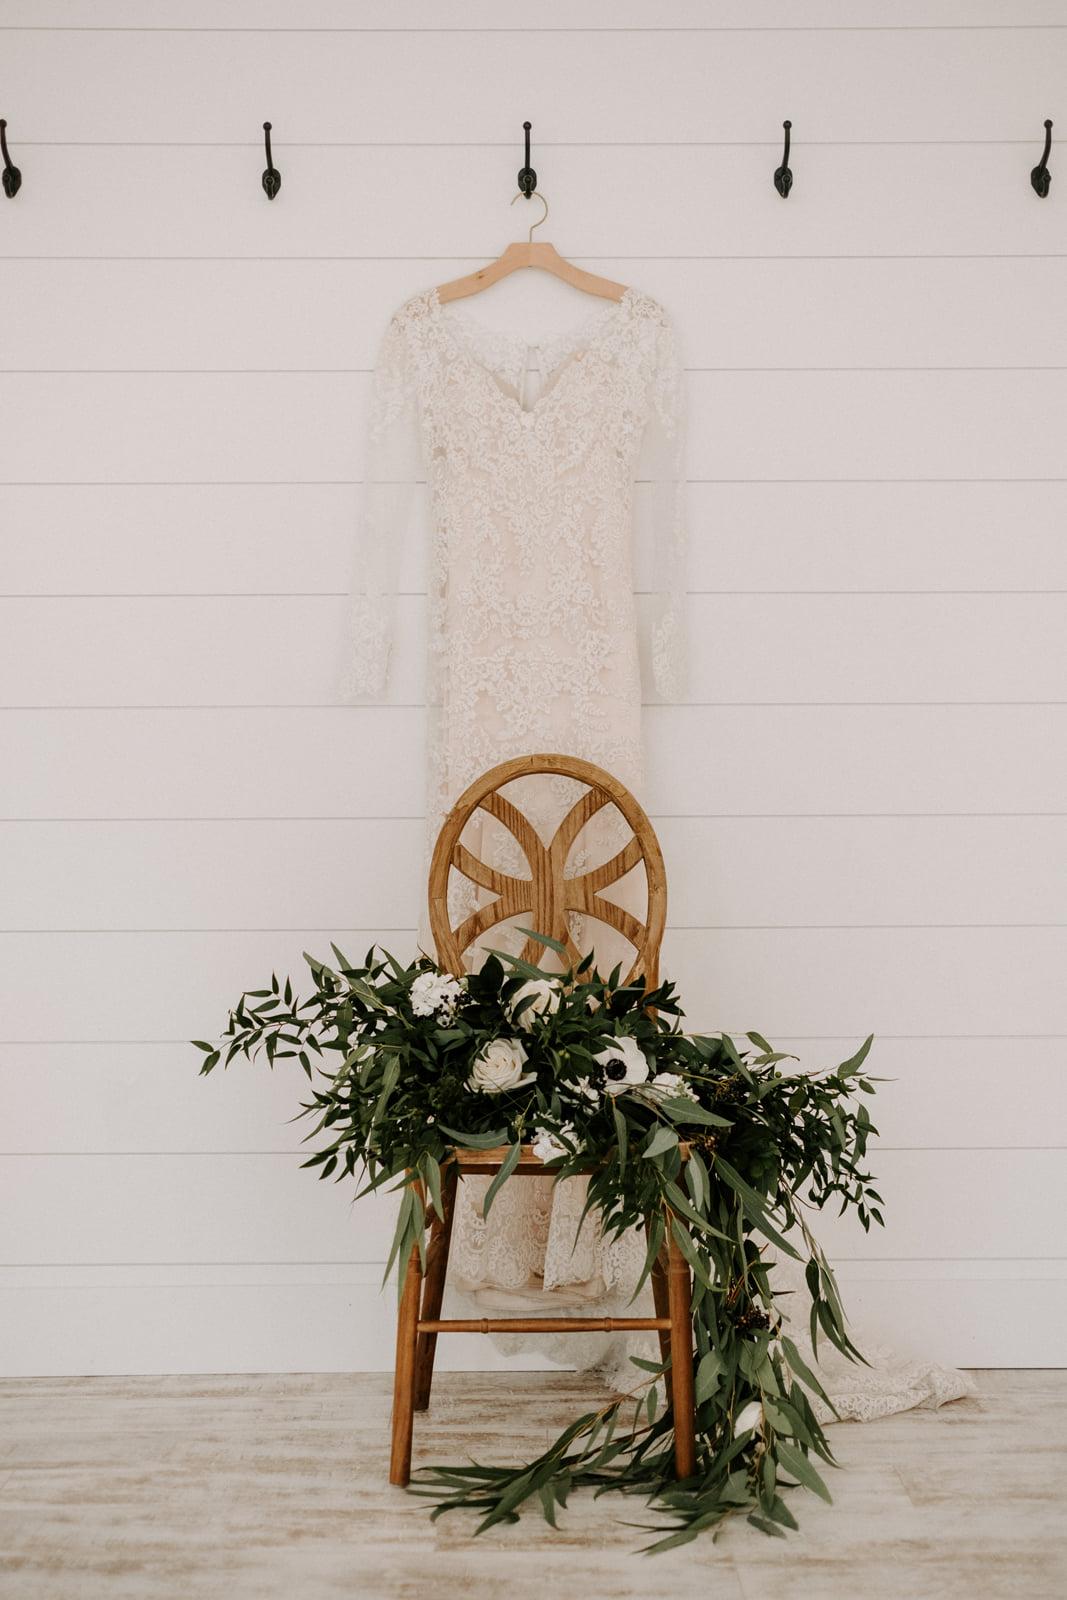 The-Barn-at-Grace-Hill-Wichita-Wedding-Venue-48.jpg